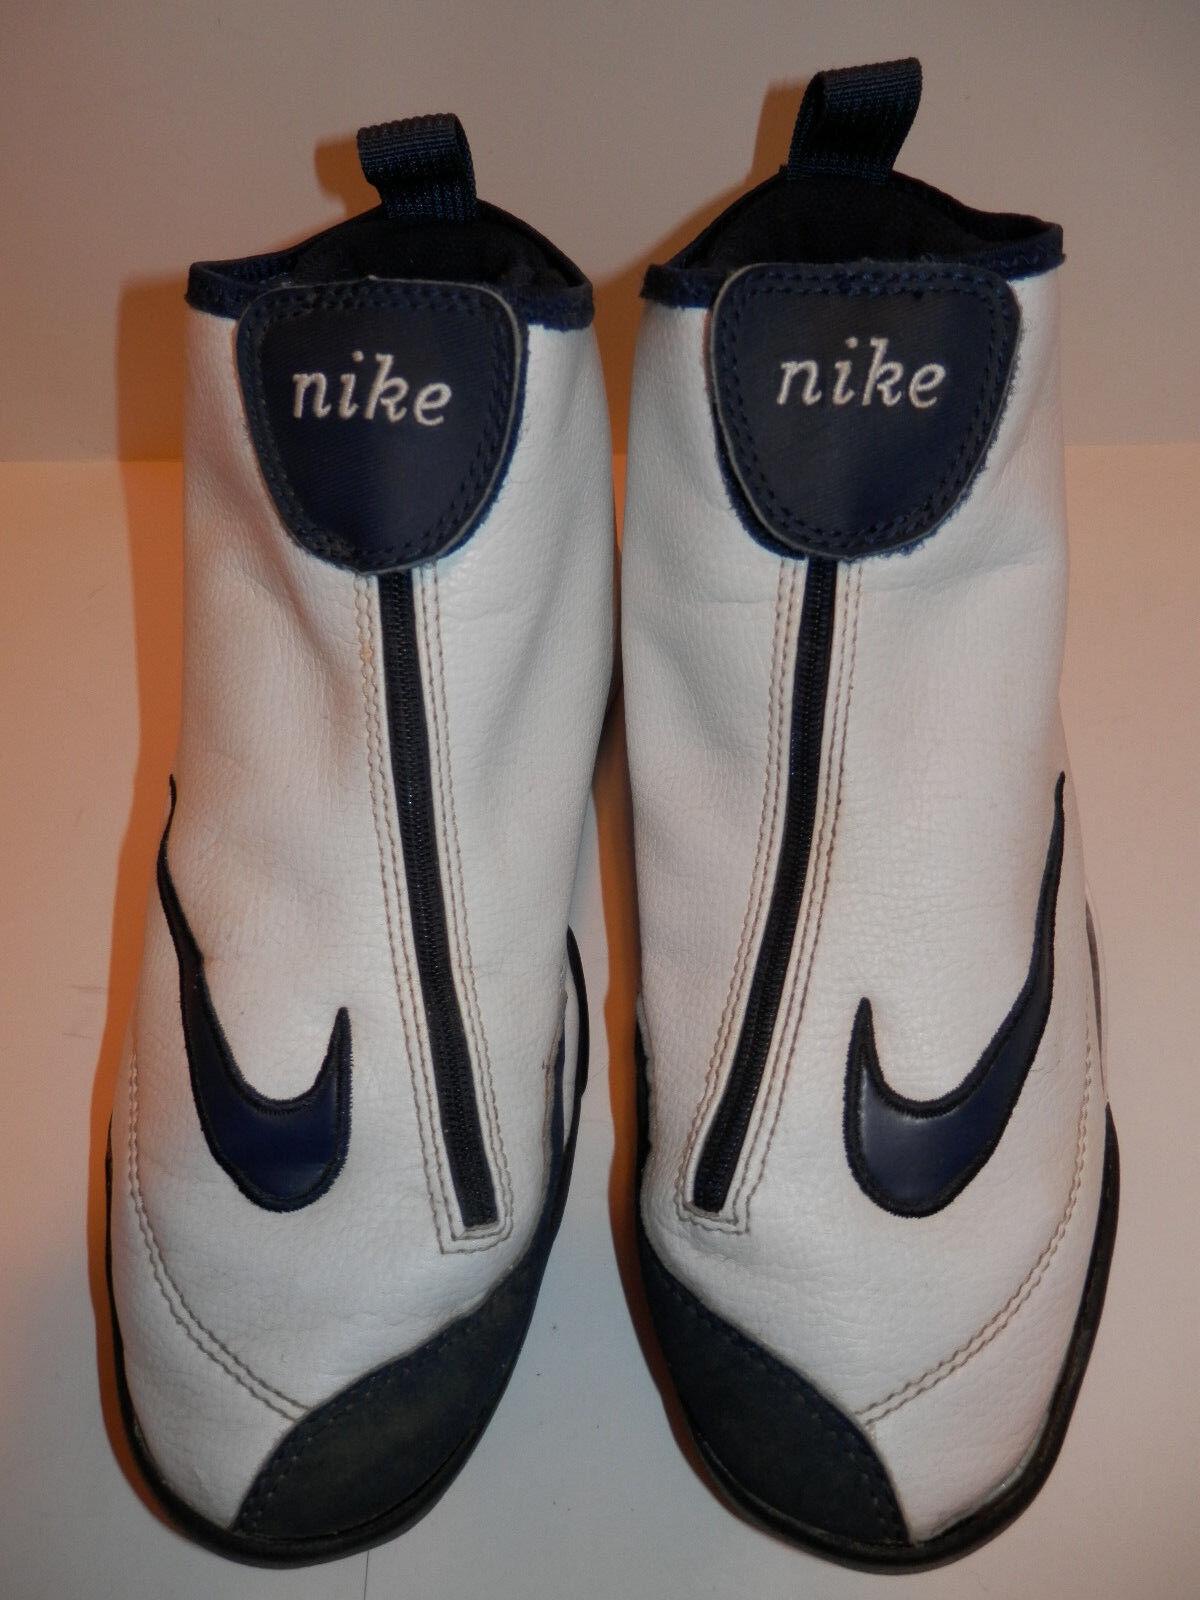 Nike uomini scarpe da basket 8 ripropone og 1999, figlio di guanto bianco blu gary payton